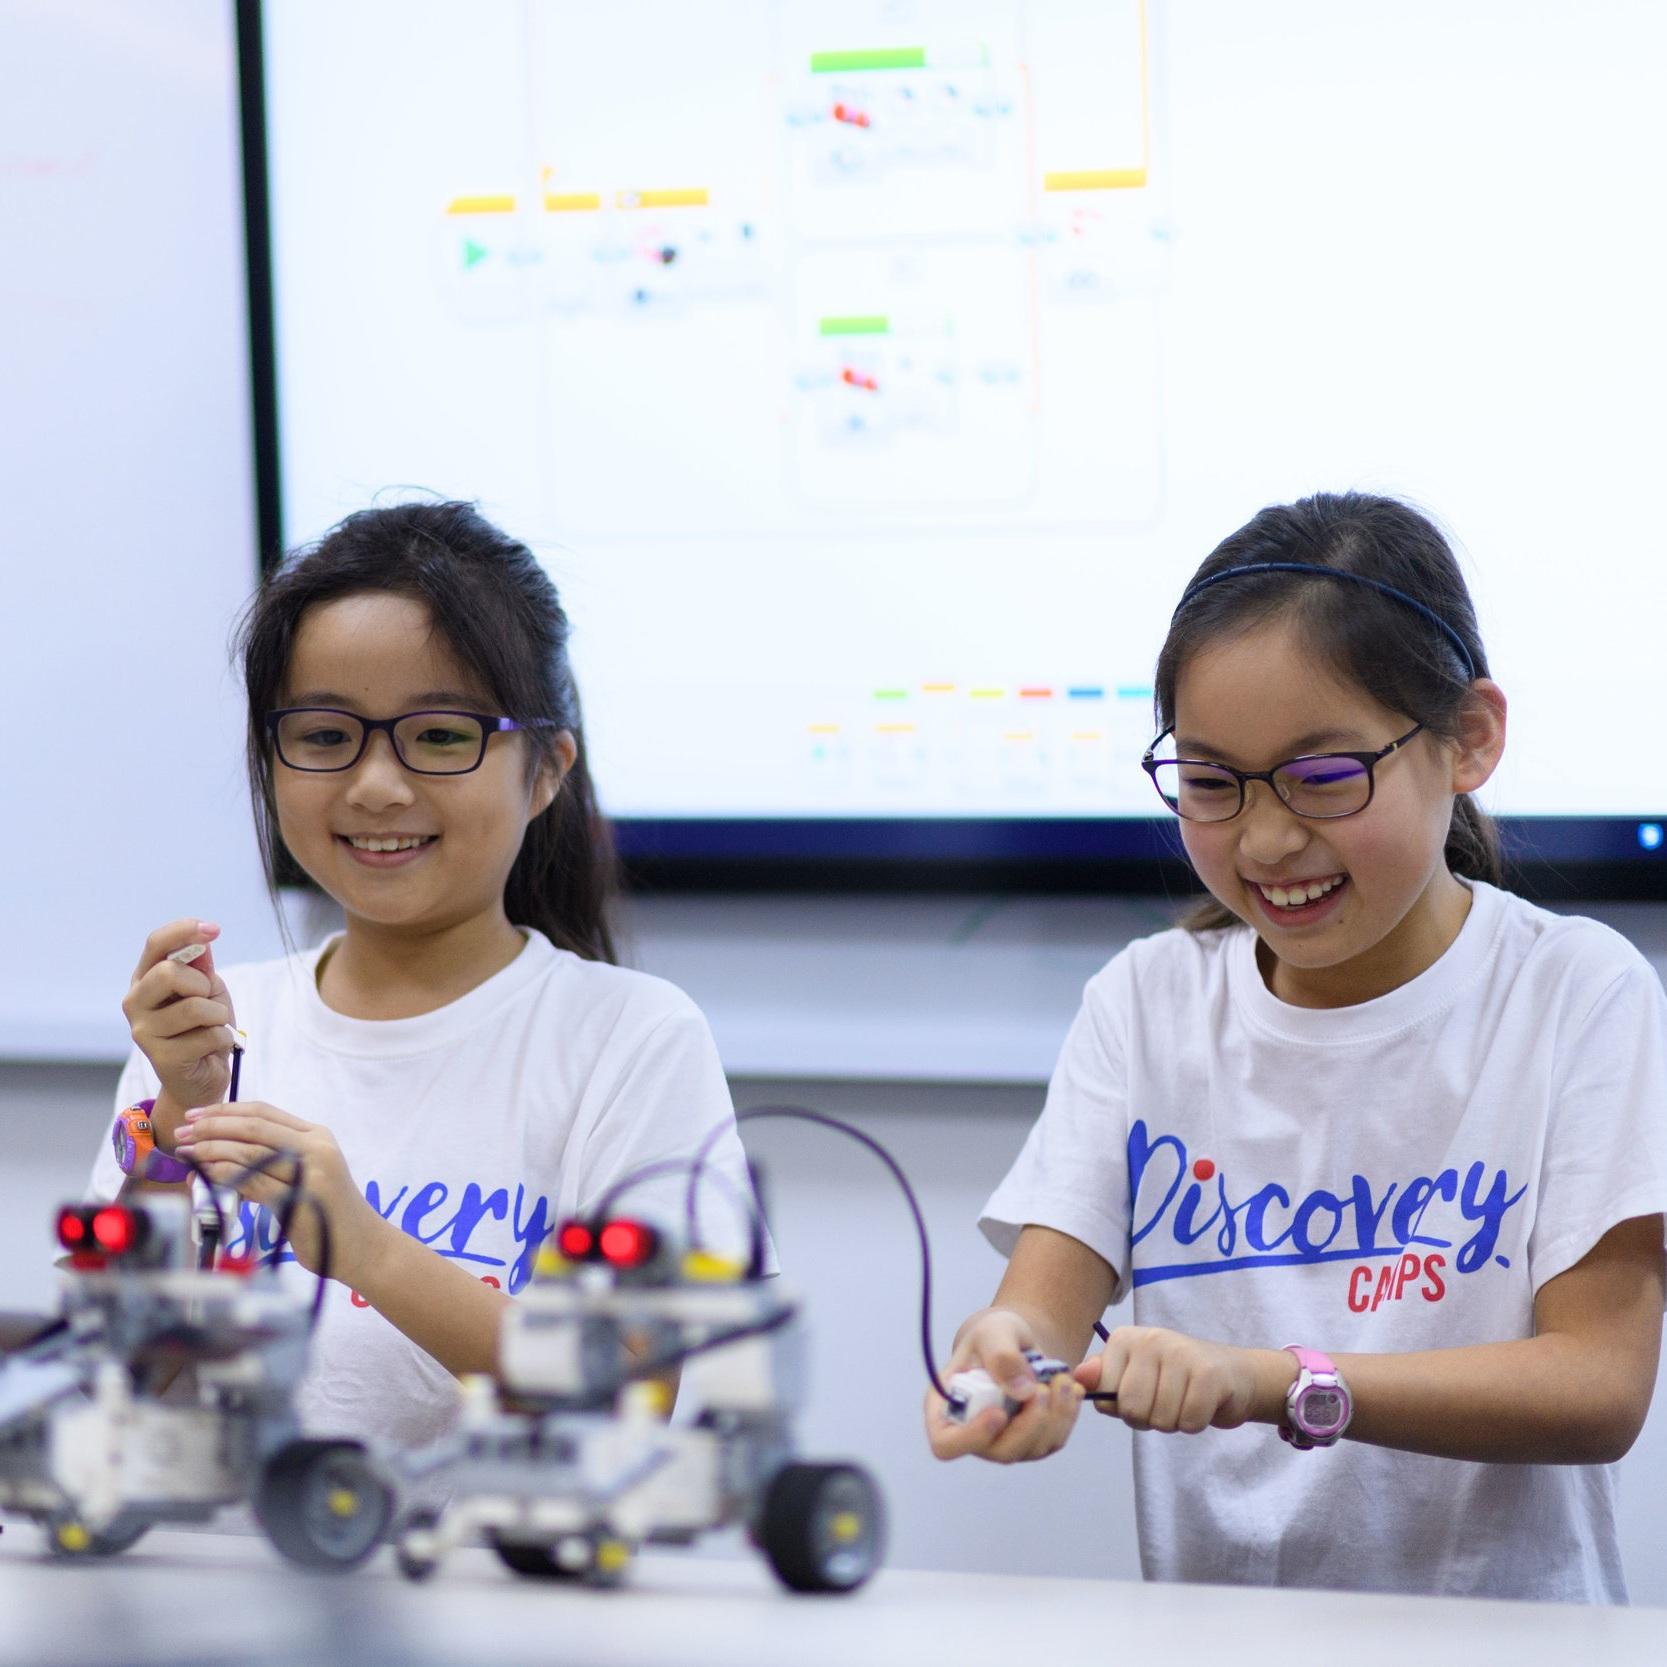 Lego+robotics+image+2.jpg